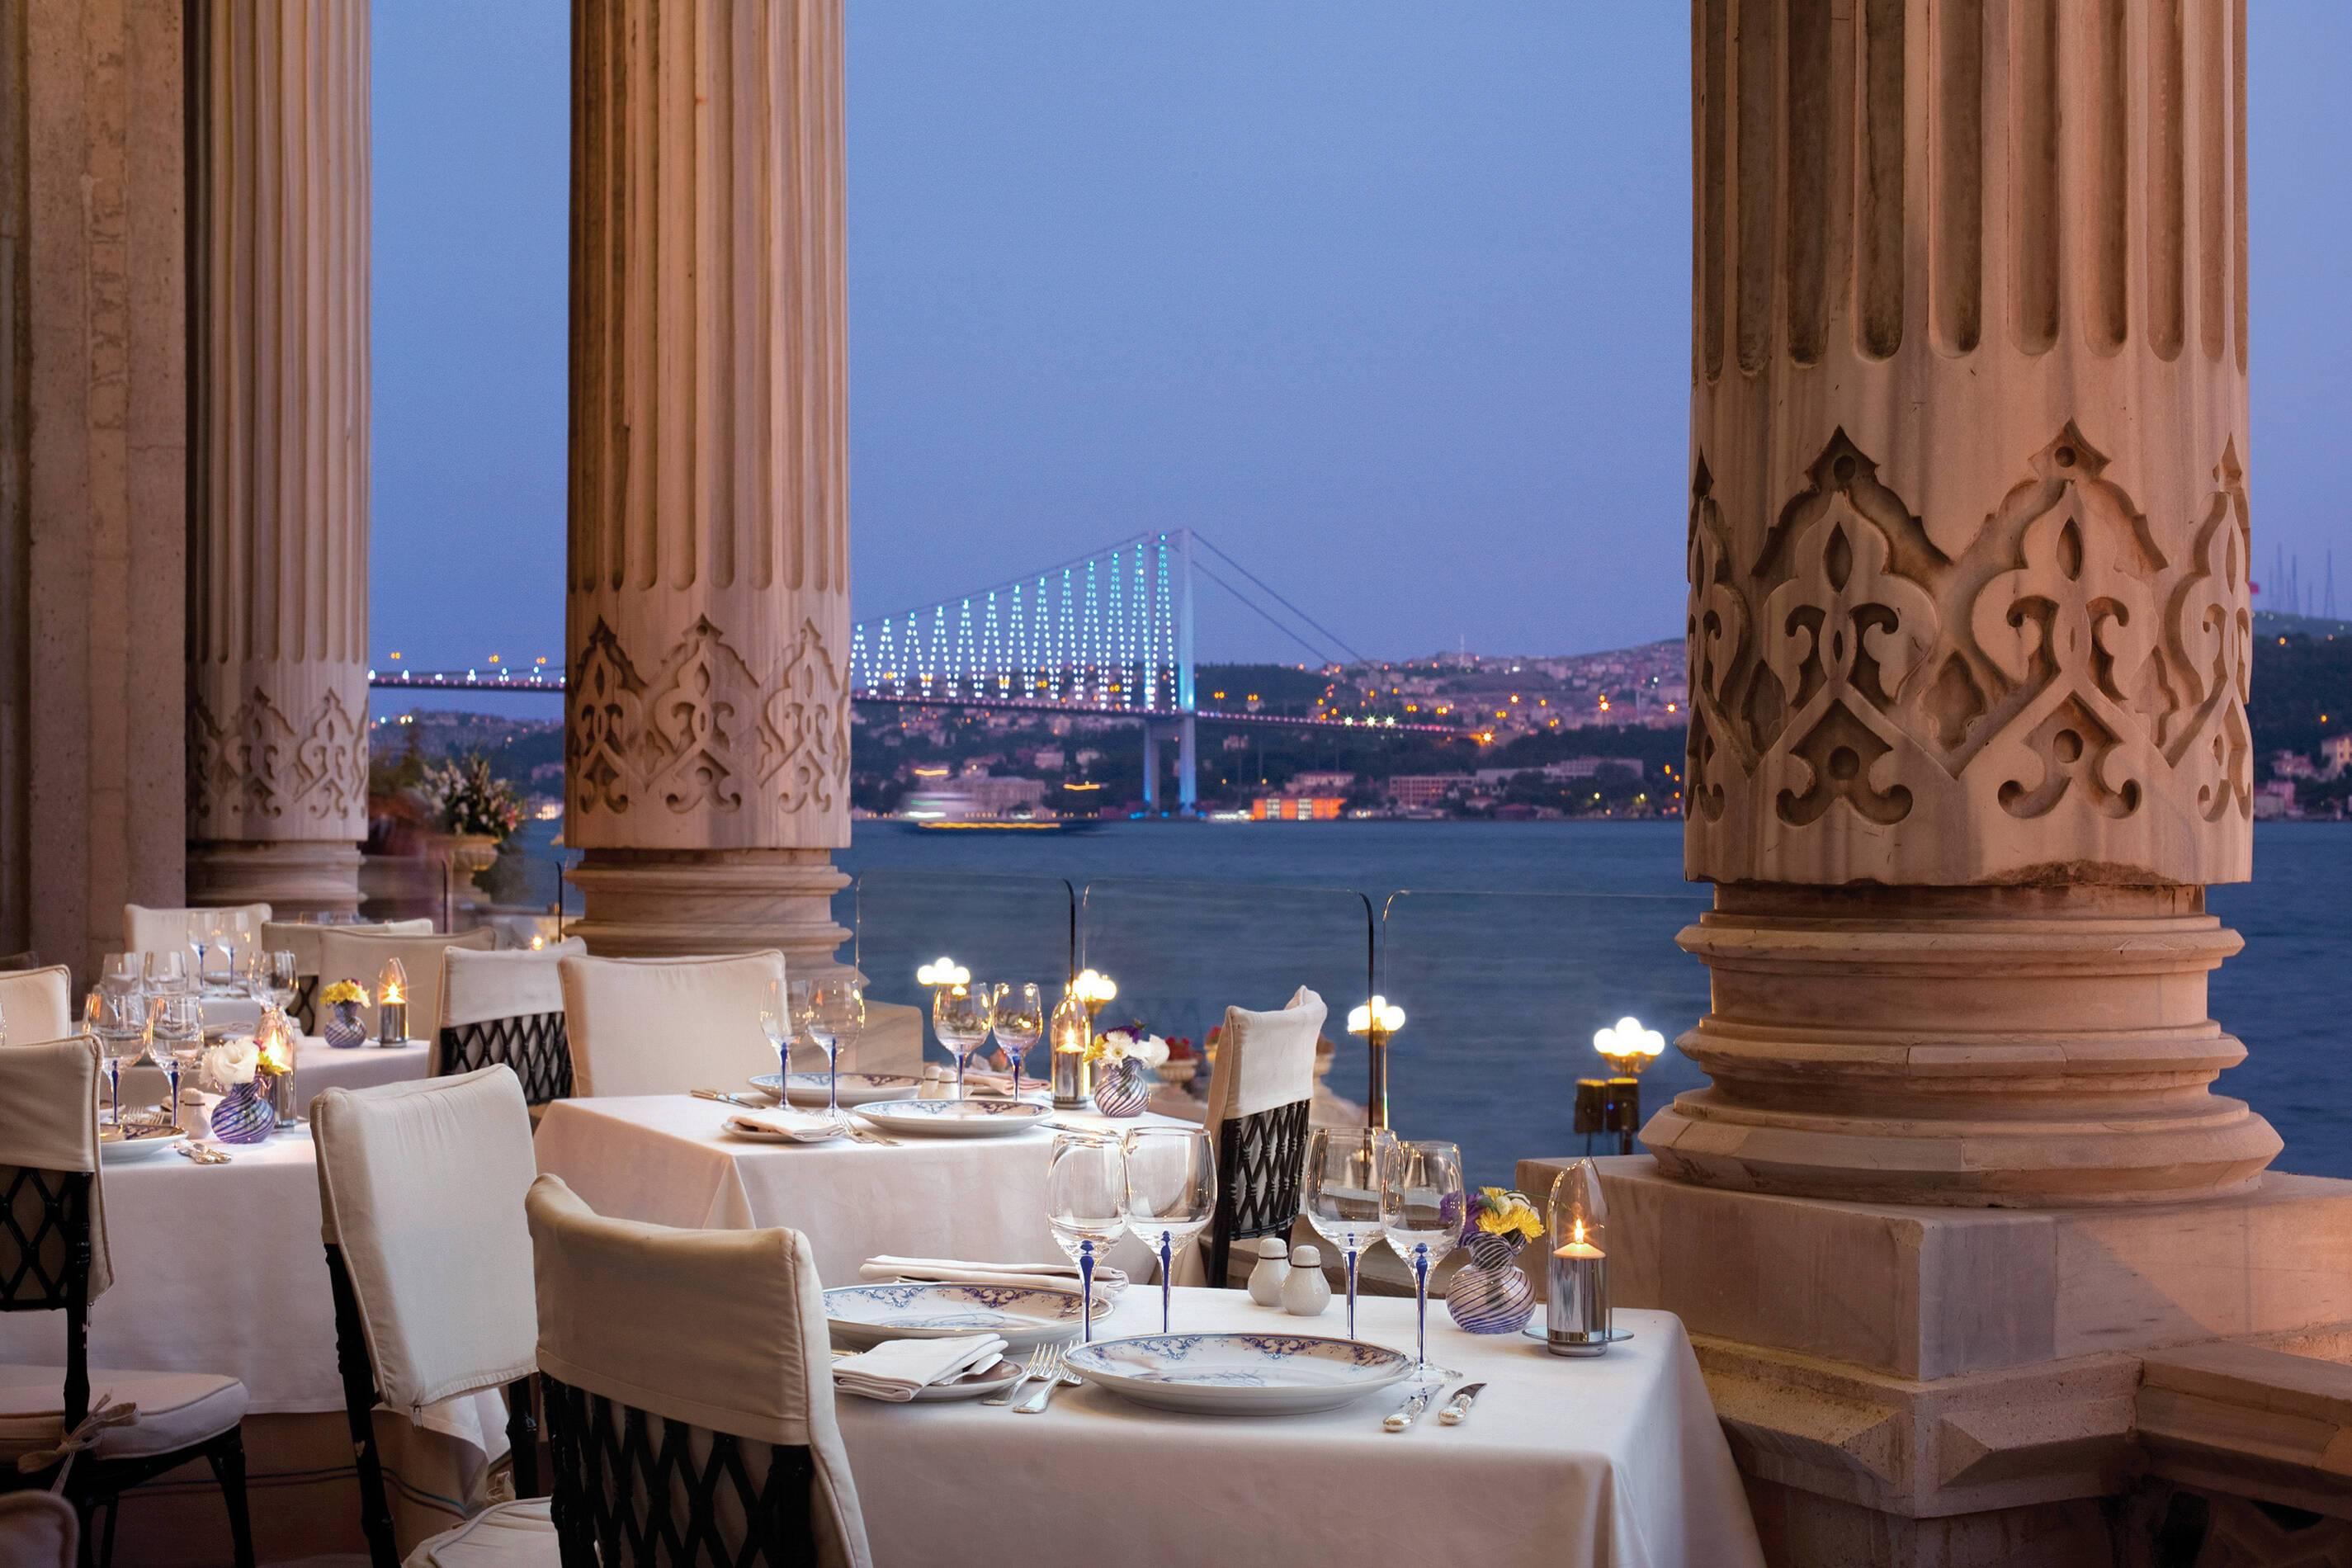 Ciragan Palace Restaurant Tugra Turquie